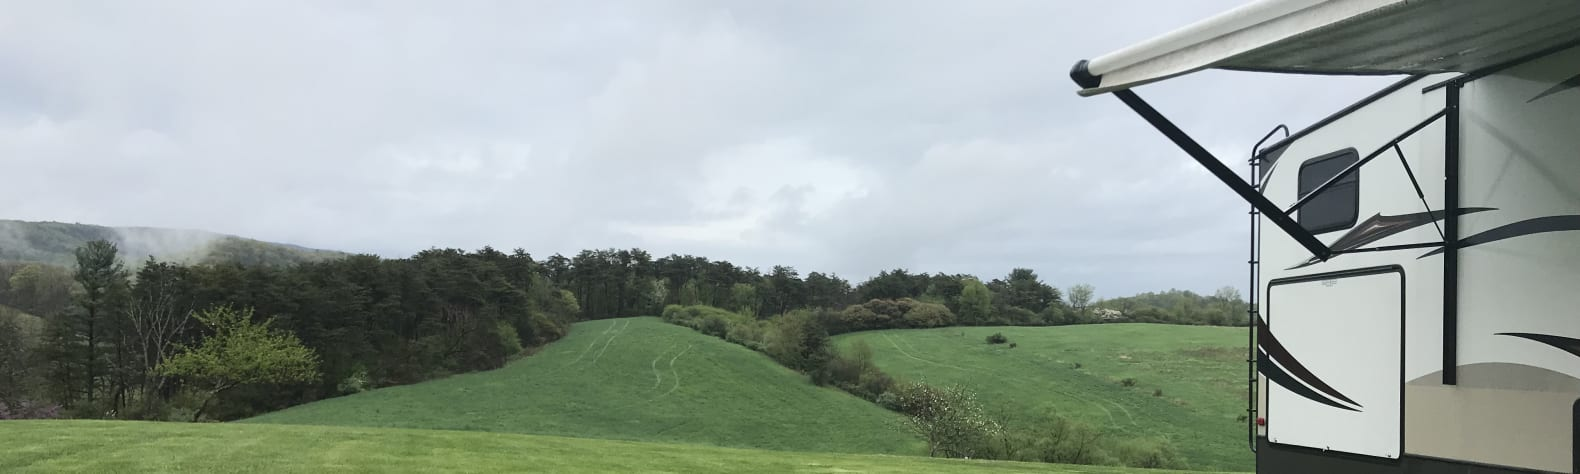 Raylene R.'s Land